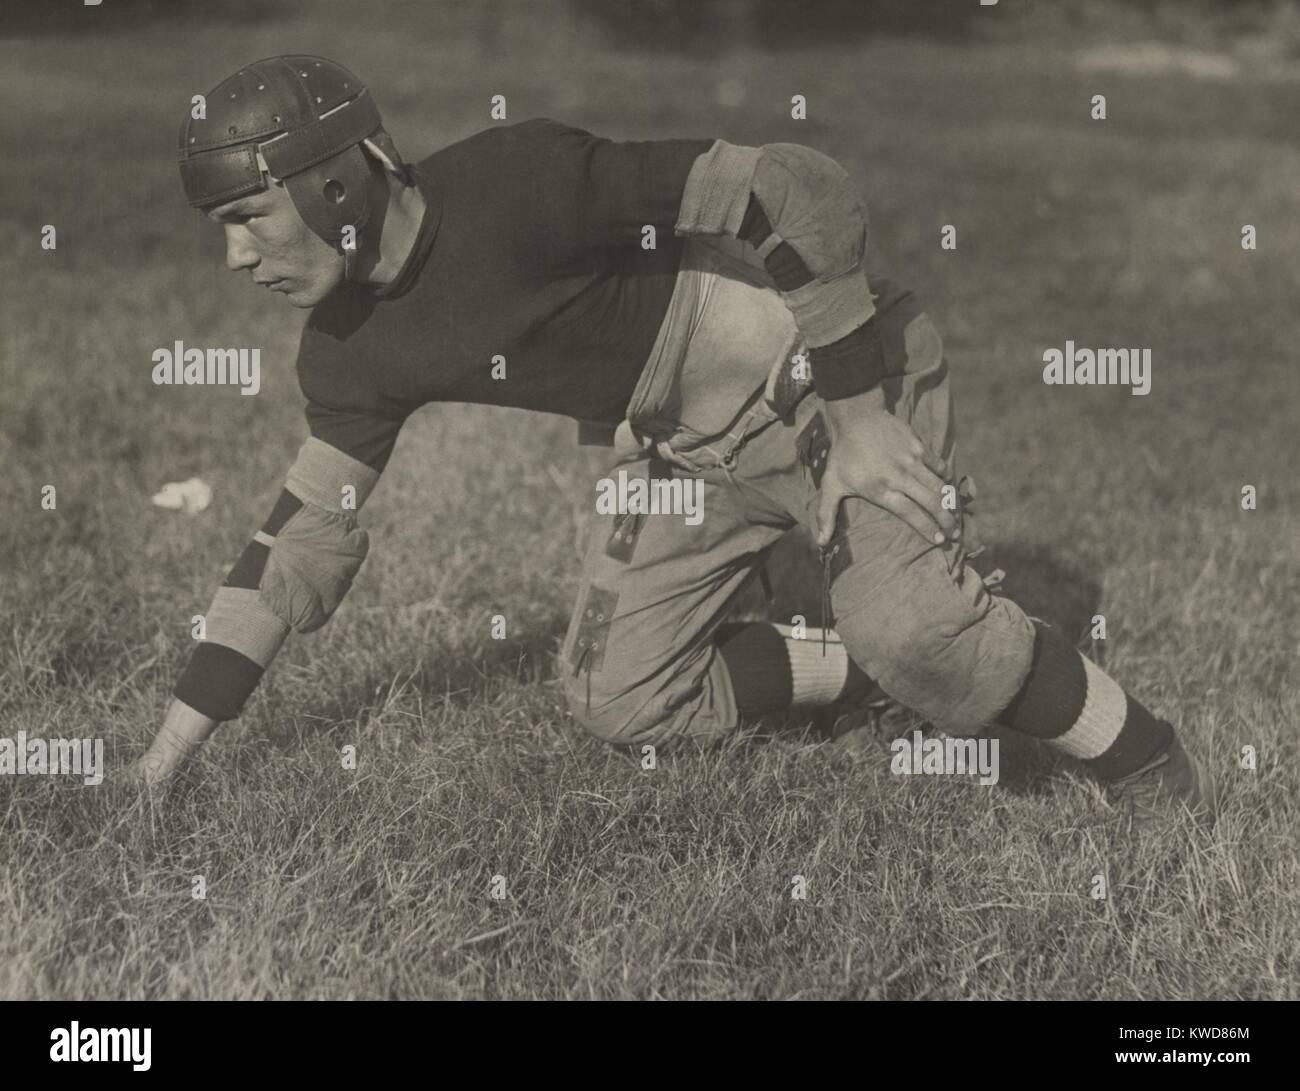 Eastern High School football player in Washington, D.C., ca. 1920-1925. (BSLOC_2015_17_128) - Stock Image